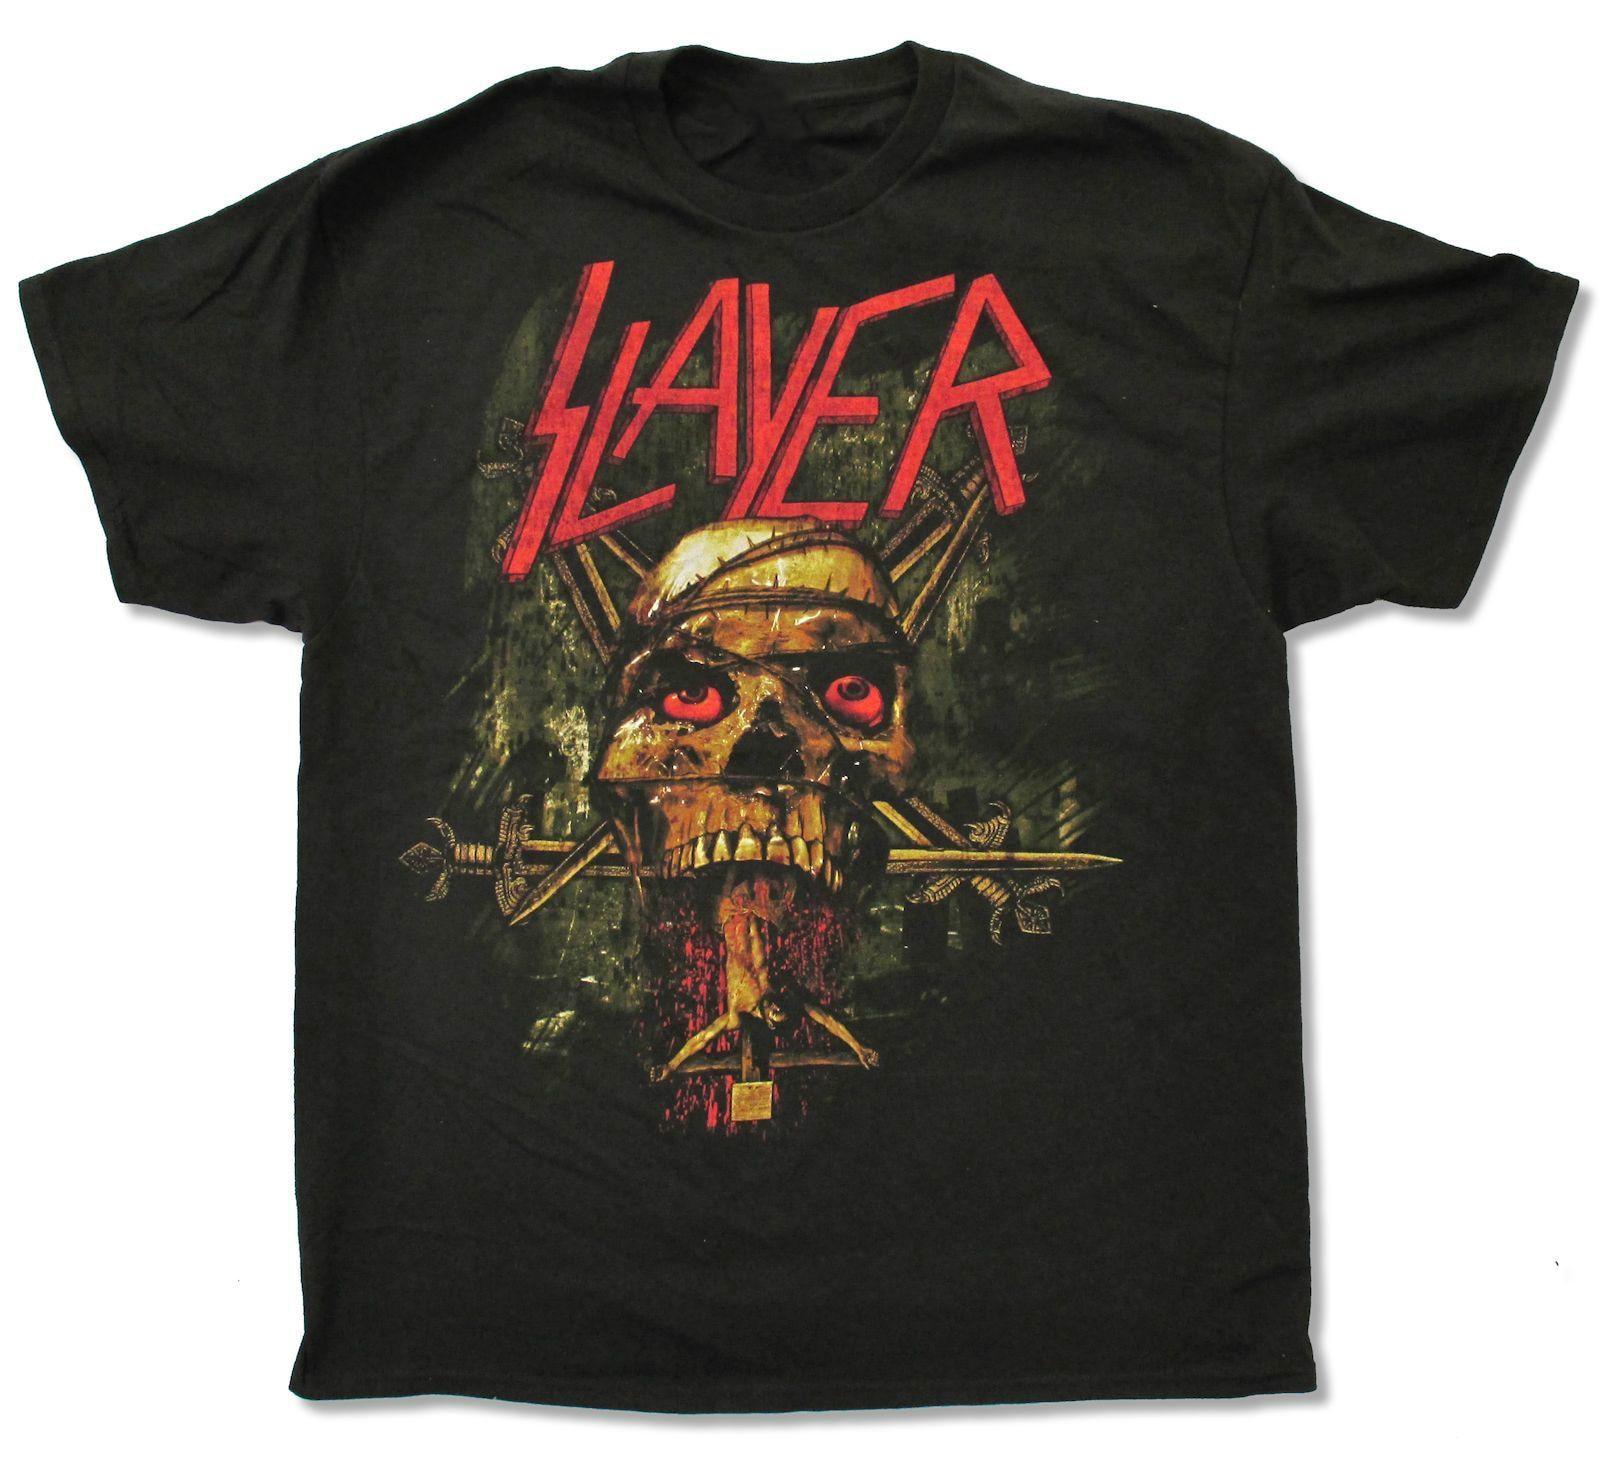 Black t shirt printing - Slayer Crucifix Black T Shirt New Official Adult Band Music Skull Cross T